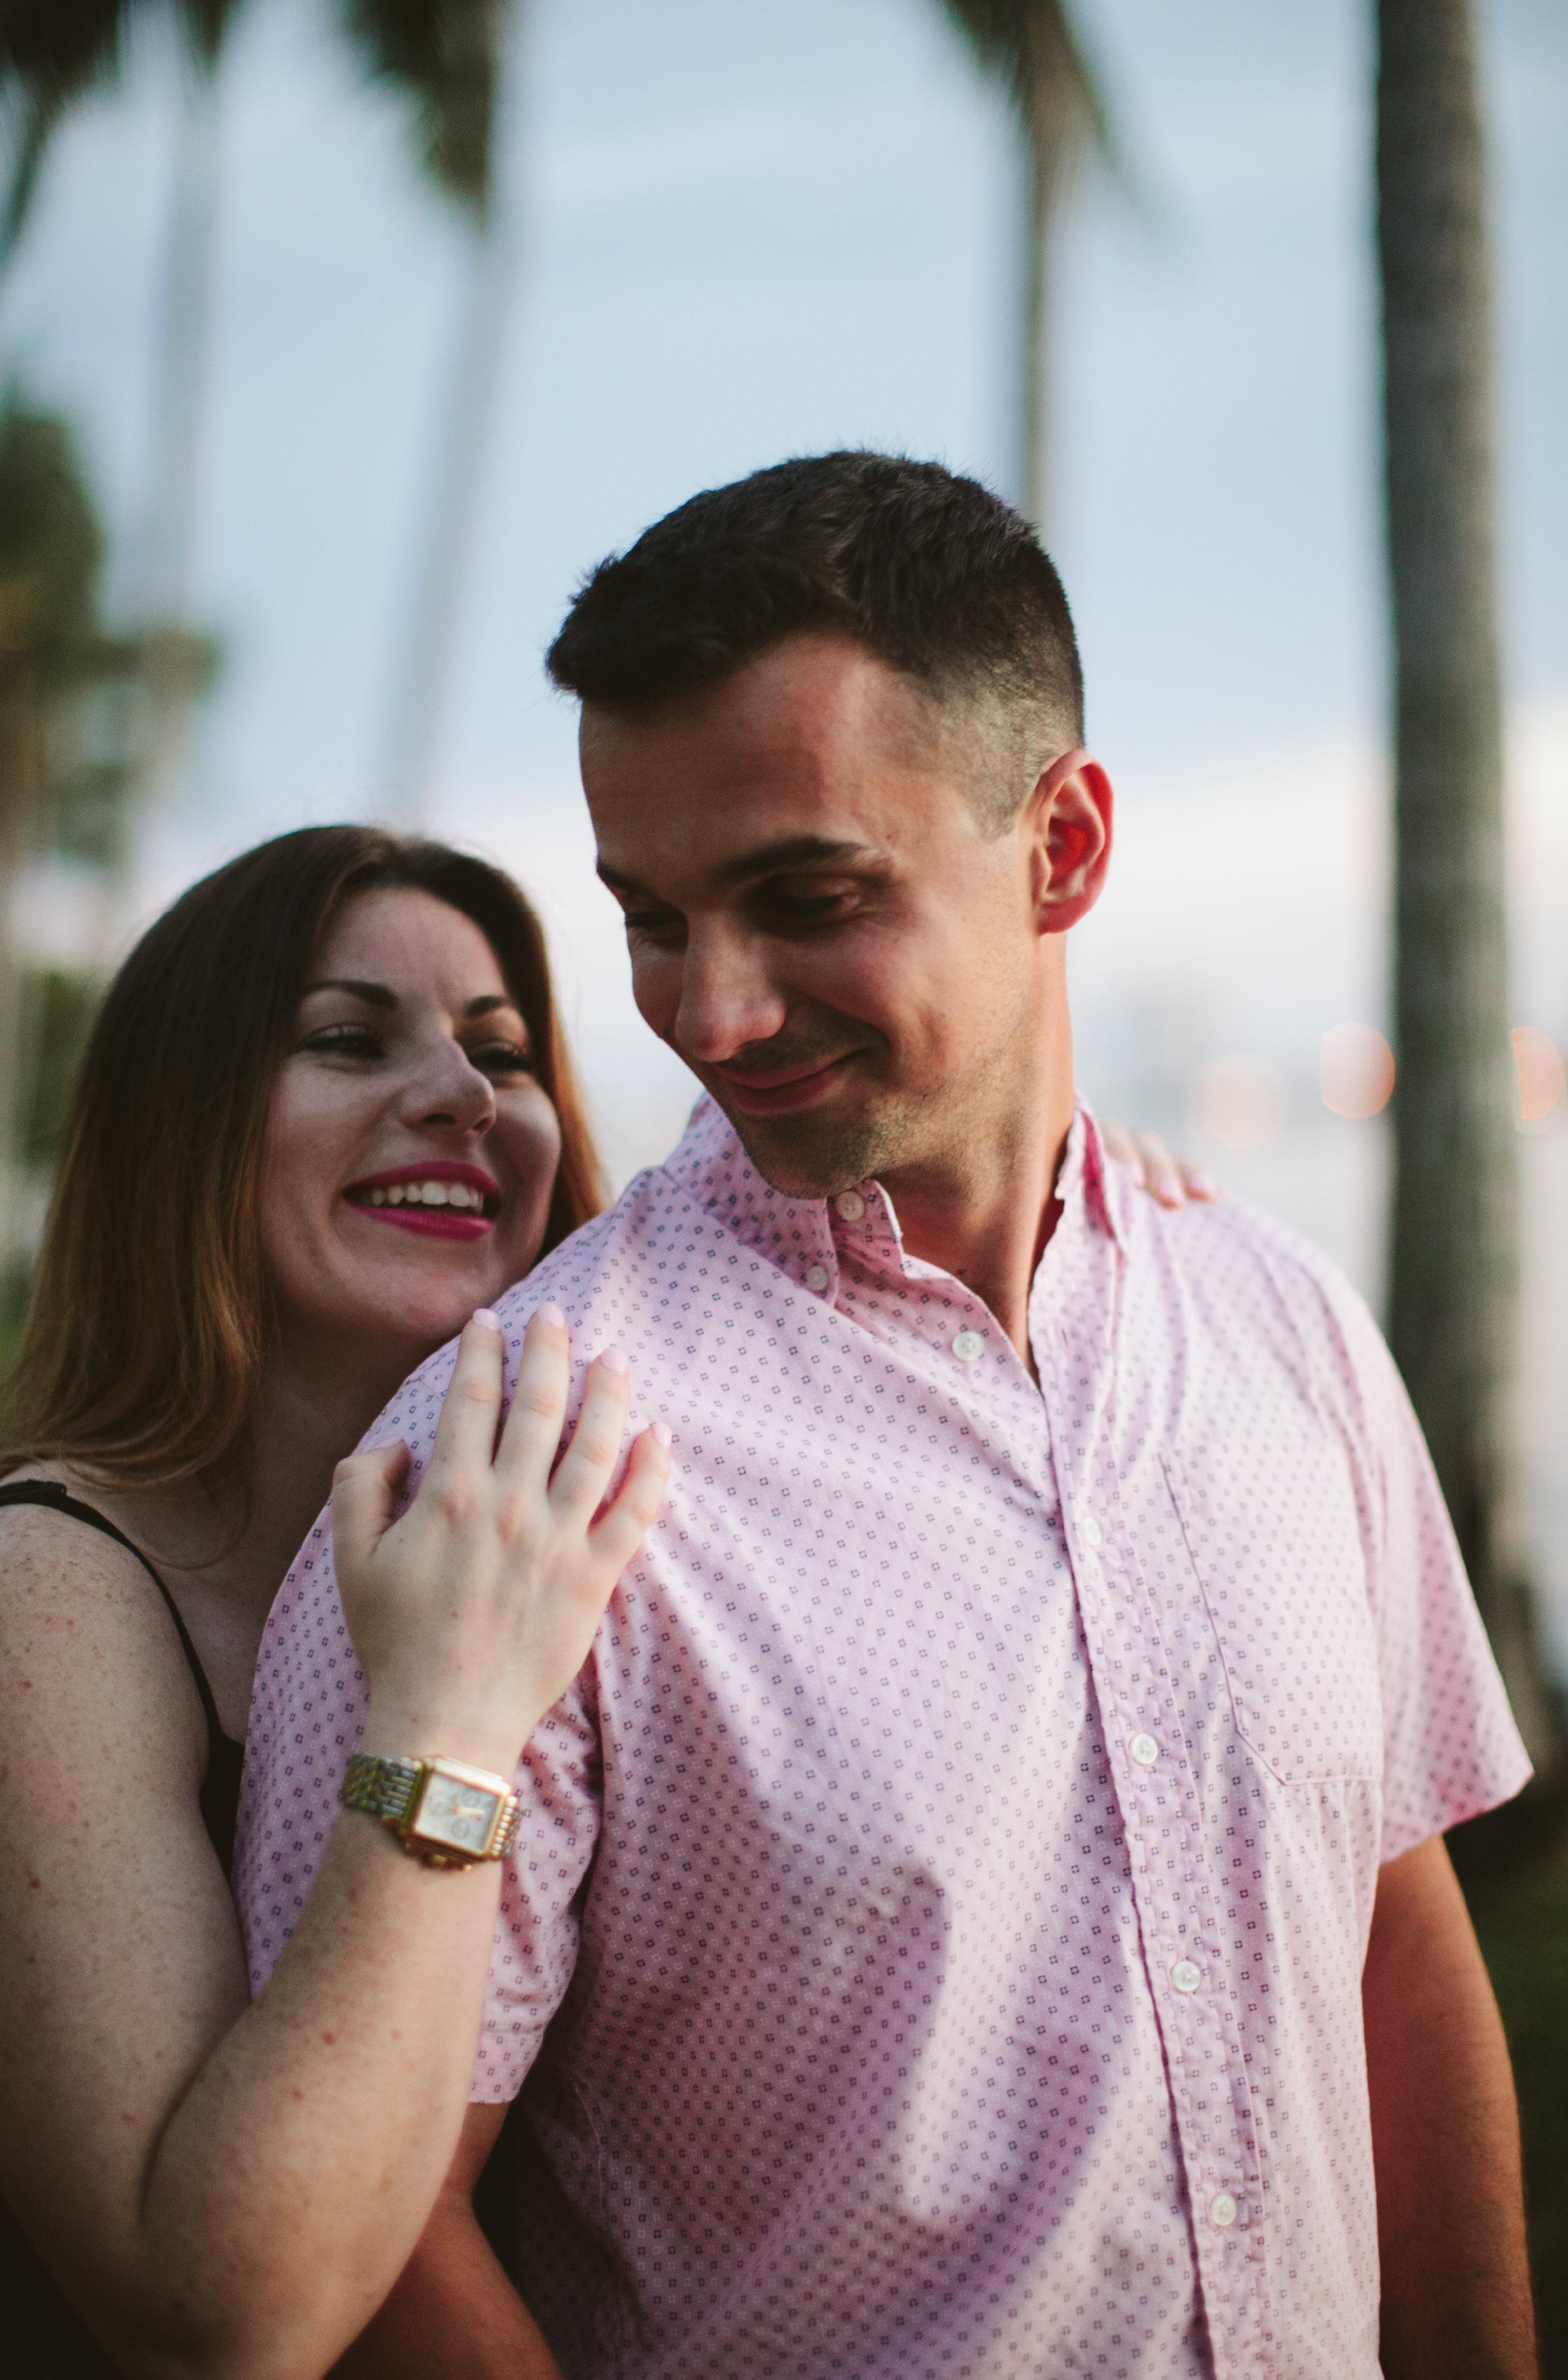 Ida + Danny Surprise Proposal Engagement Shoot at Flagler Museum Palm Beach15.jpg